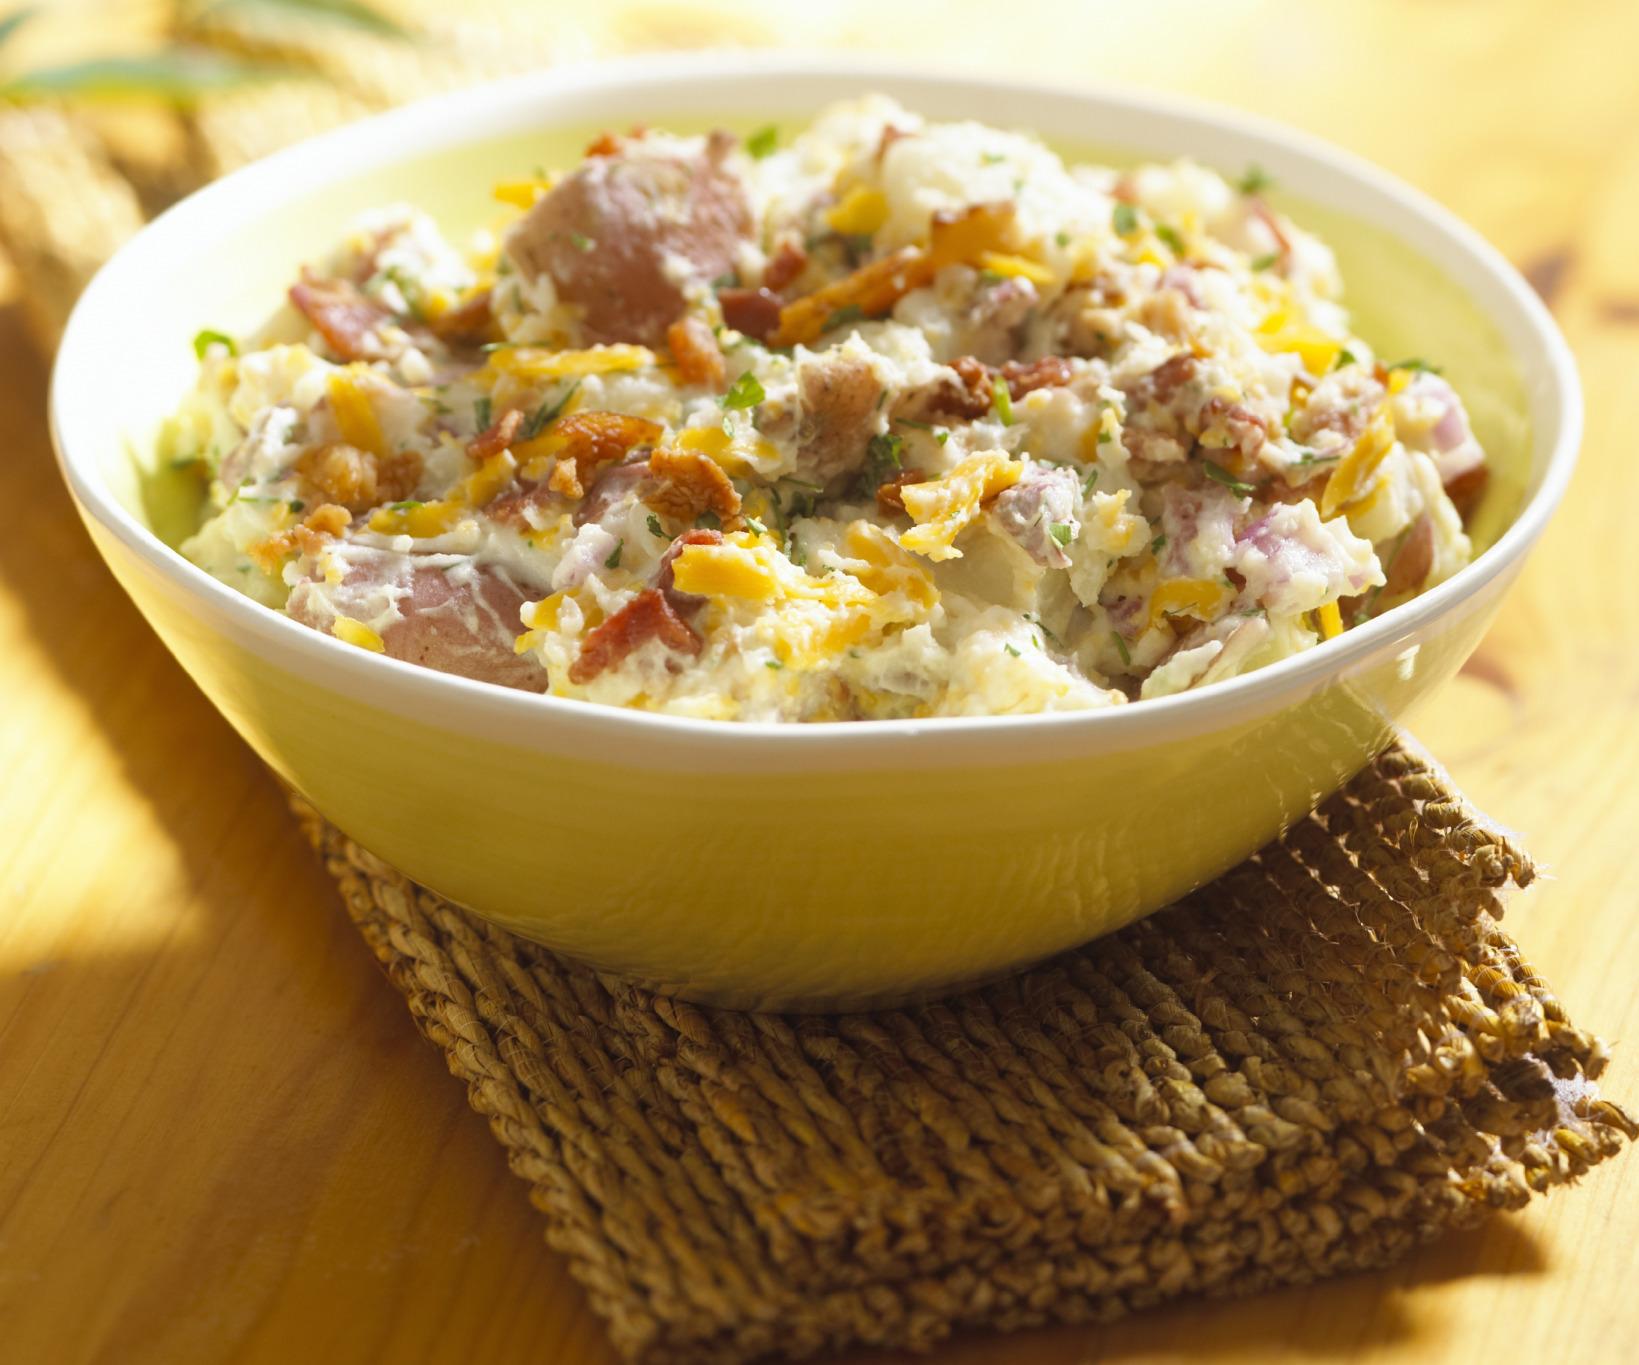 Baked potato salad 201005041940361